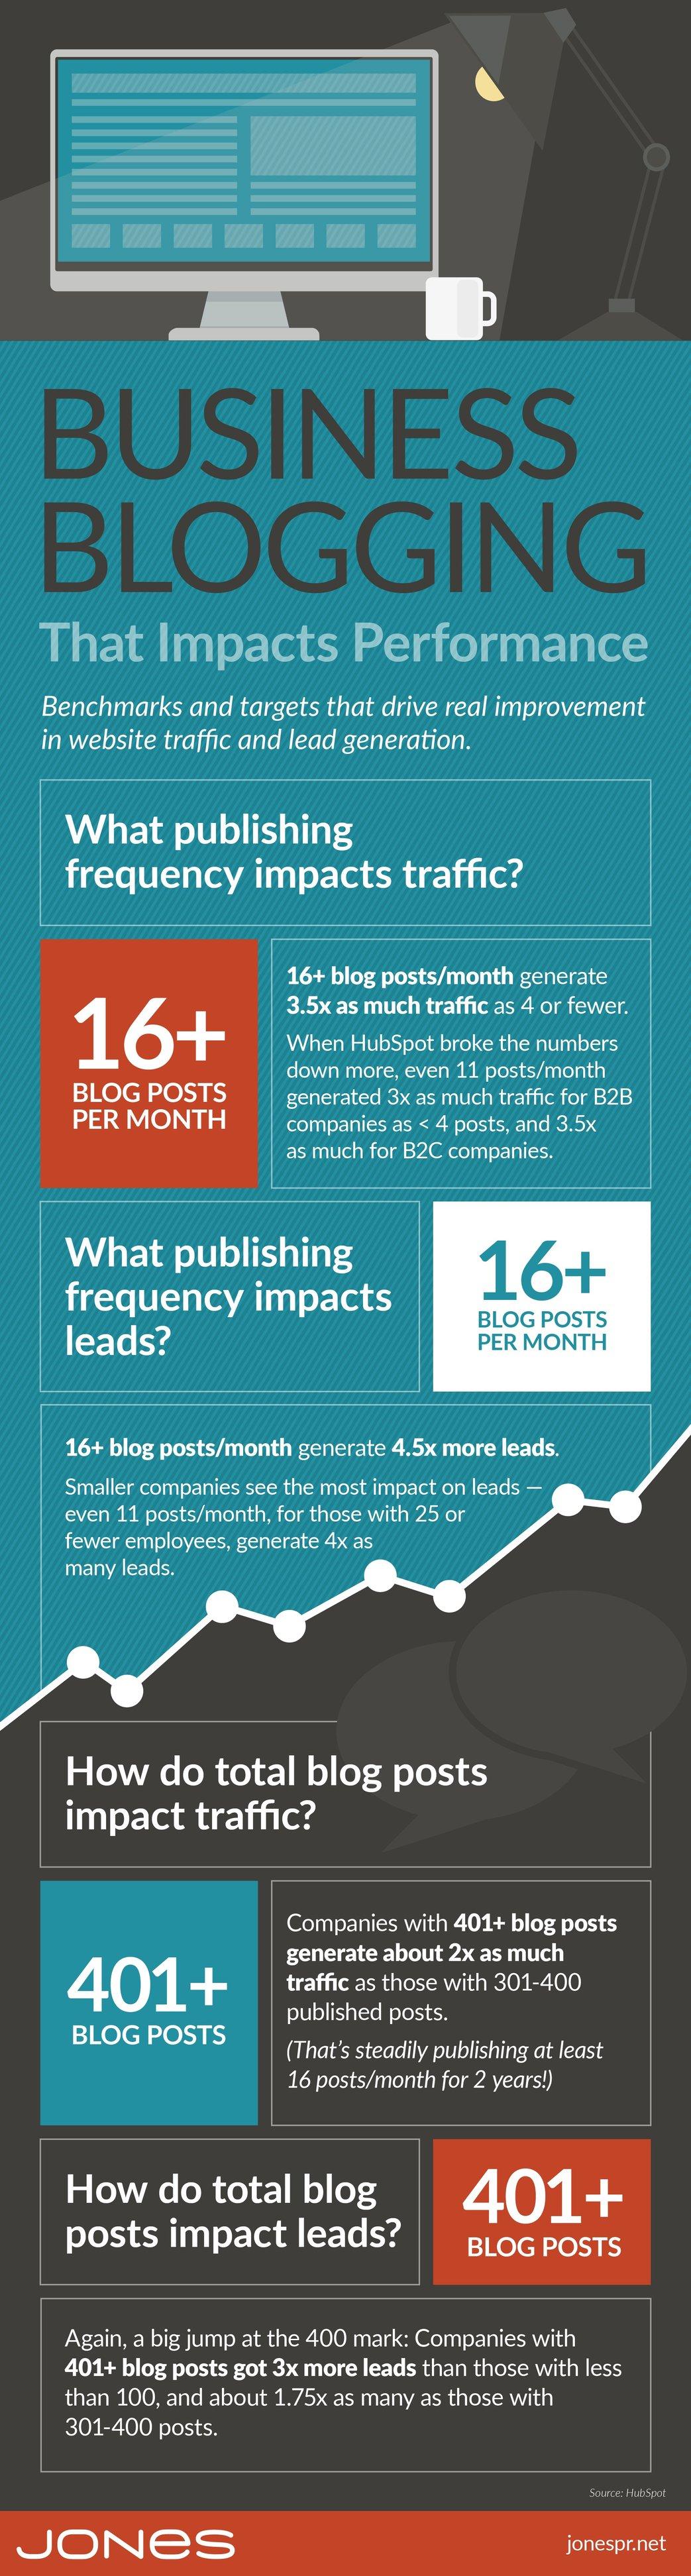 jones-infographic-business-blog-benchmarks-v2